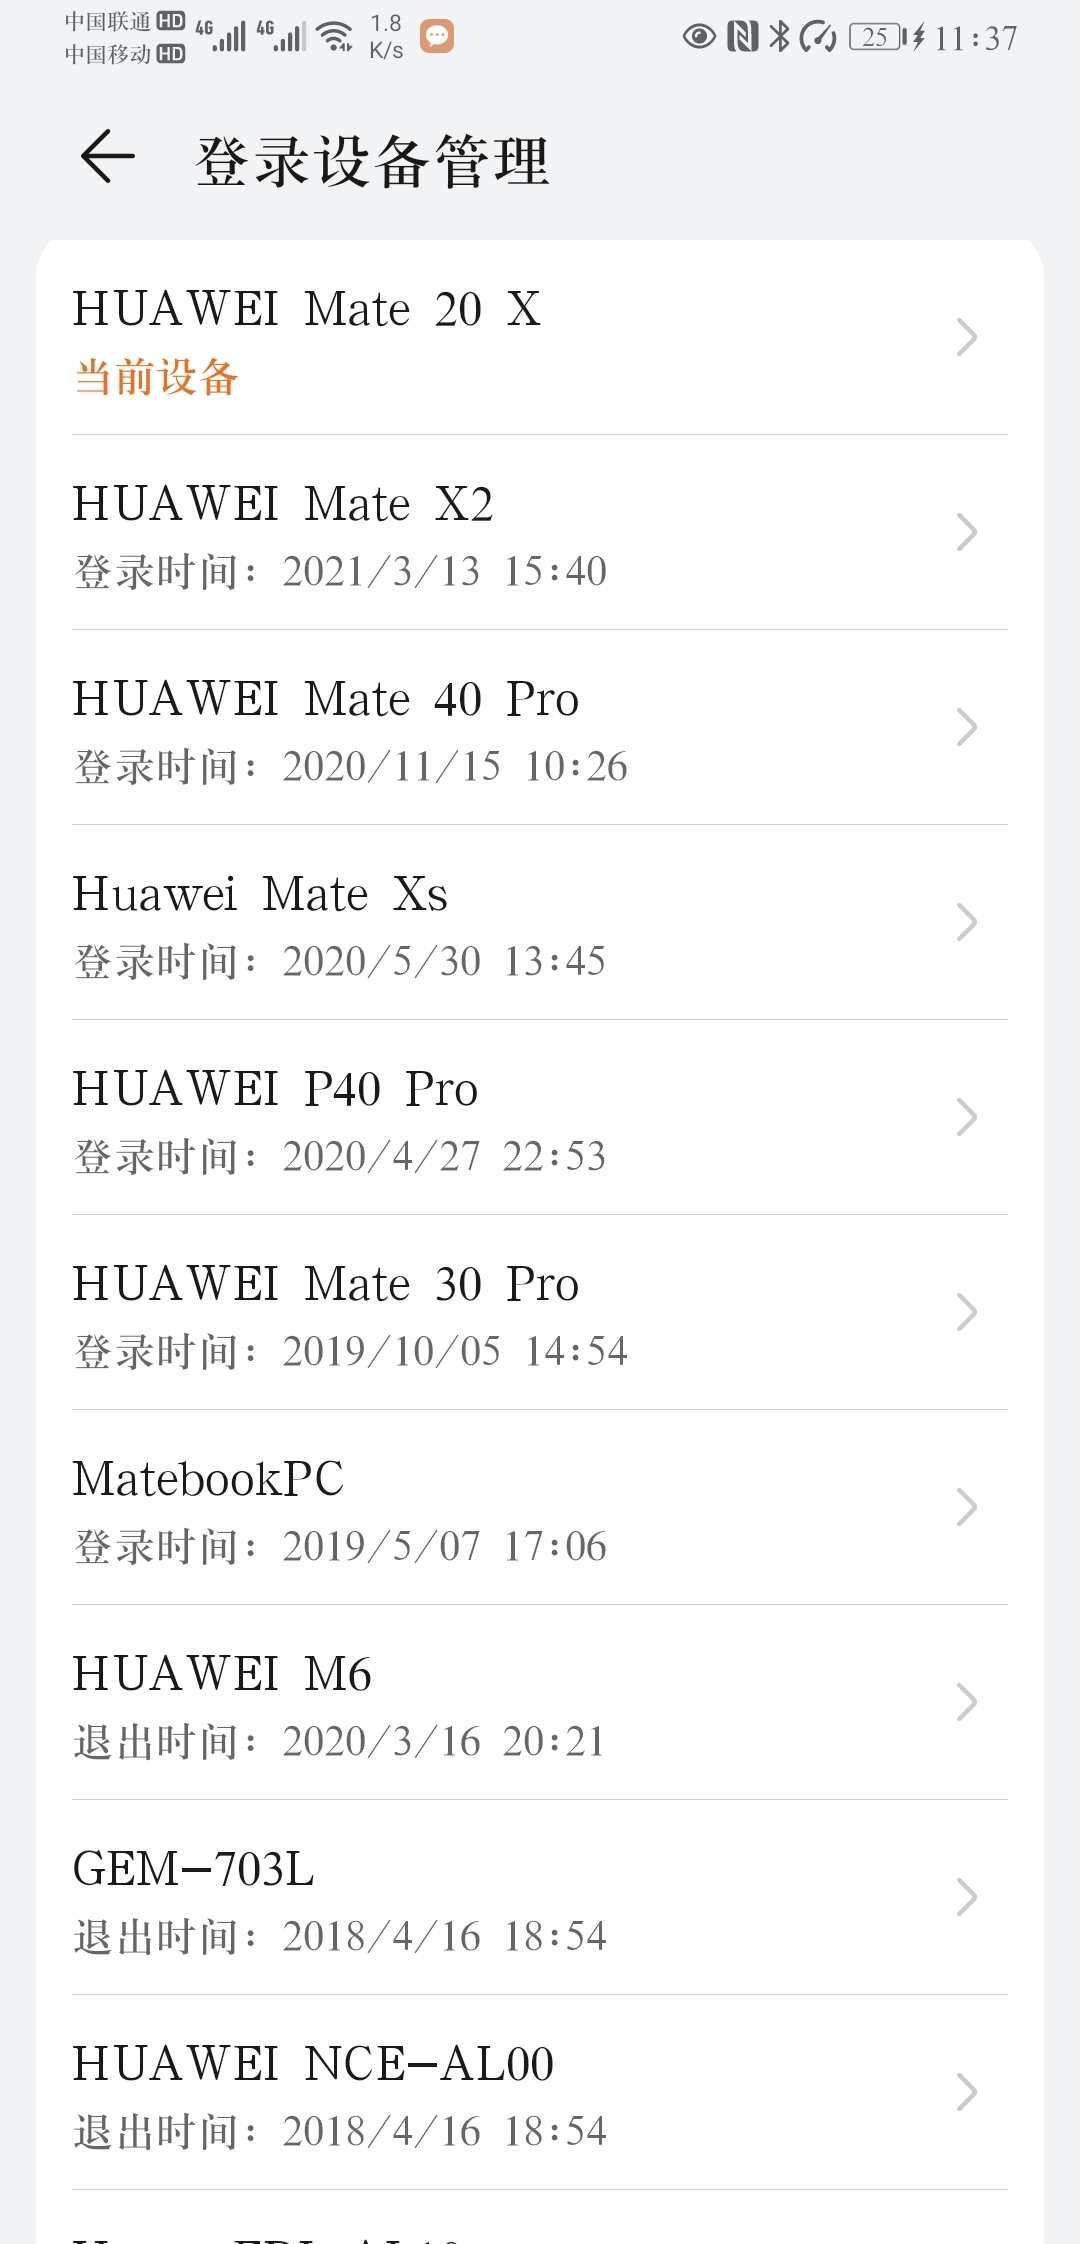 Screenshot_20210814_113720_com.huawei.hwid.jpg